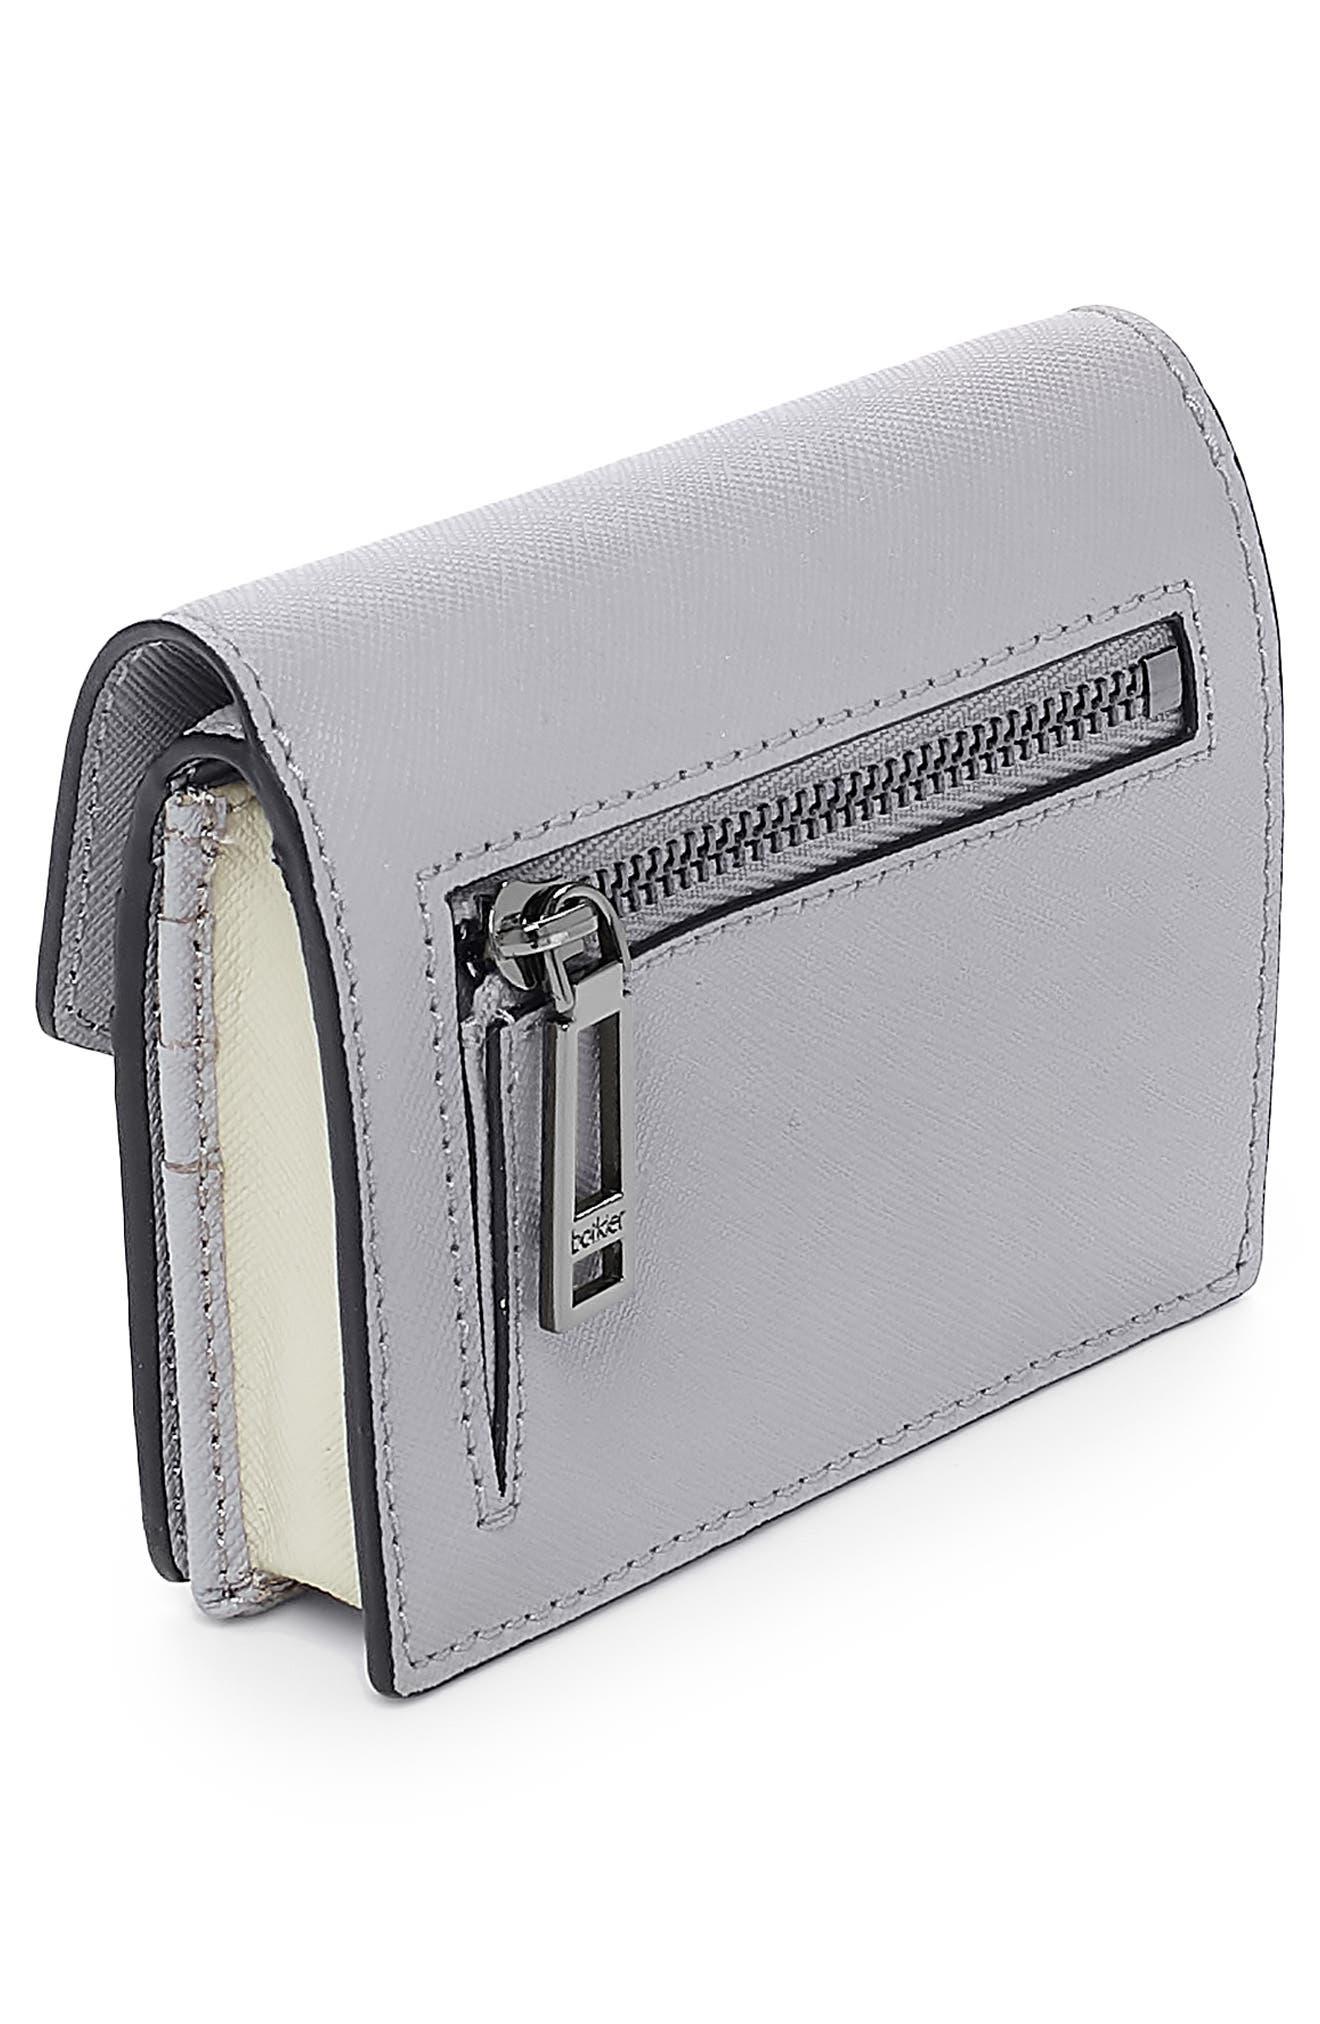 BOTKIER,                             Mini Cobble Hill Colorblock Leather Wallet,                             Alternate thumbnail 3, color,                             PEWTER COMBO